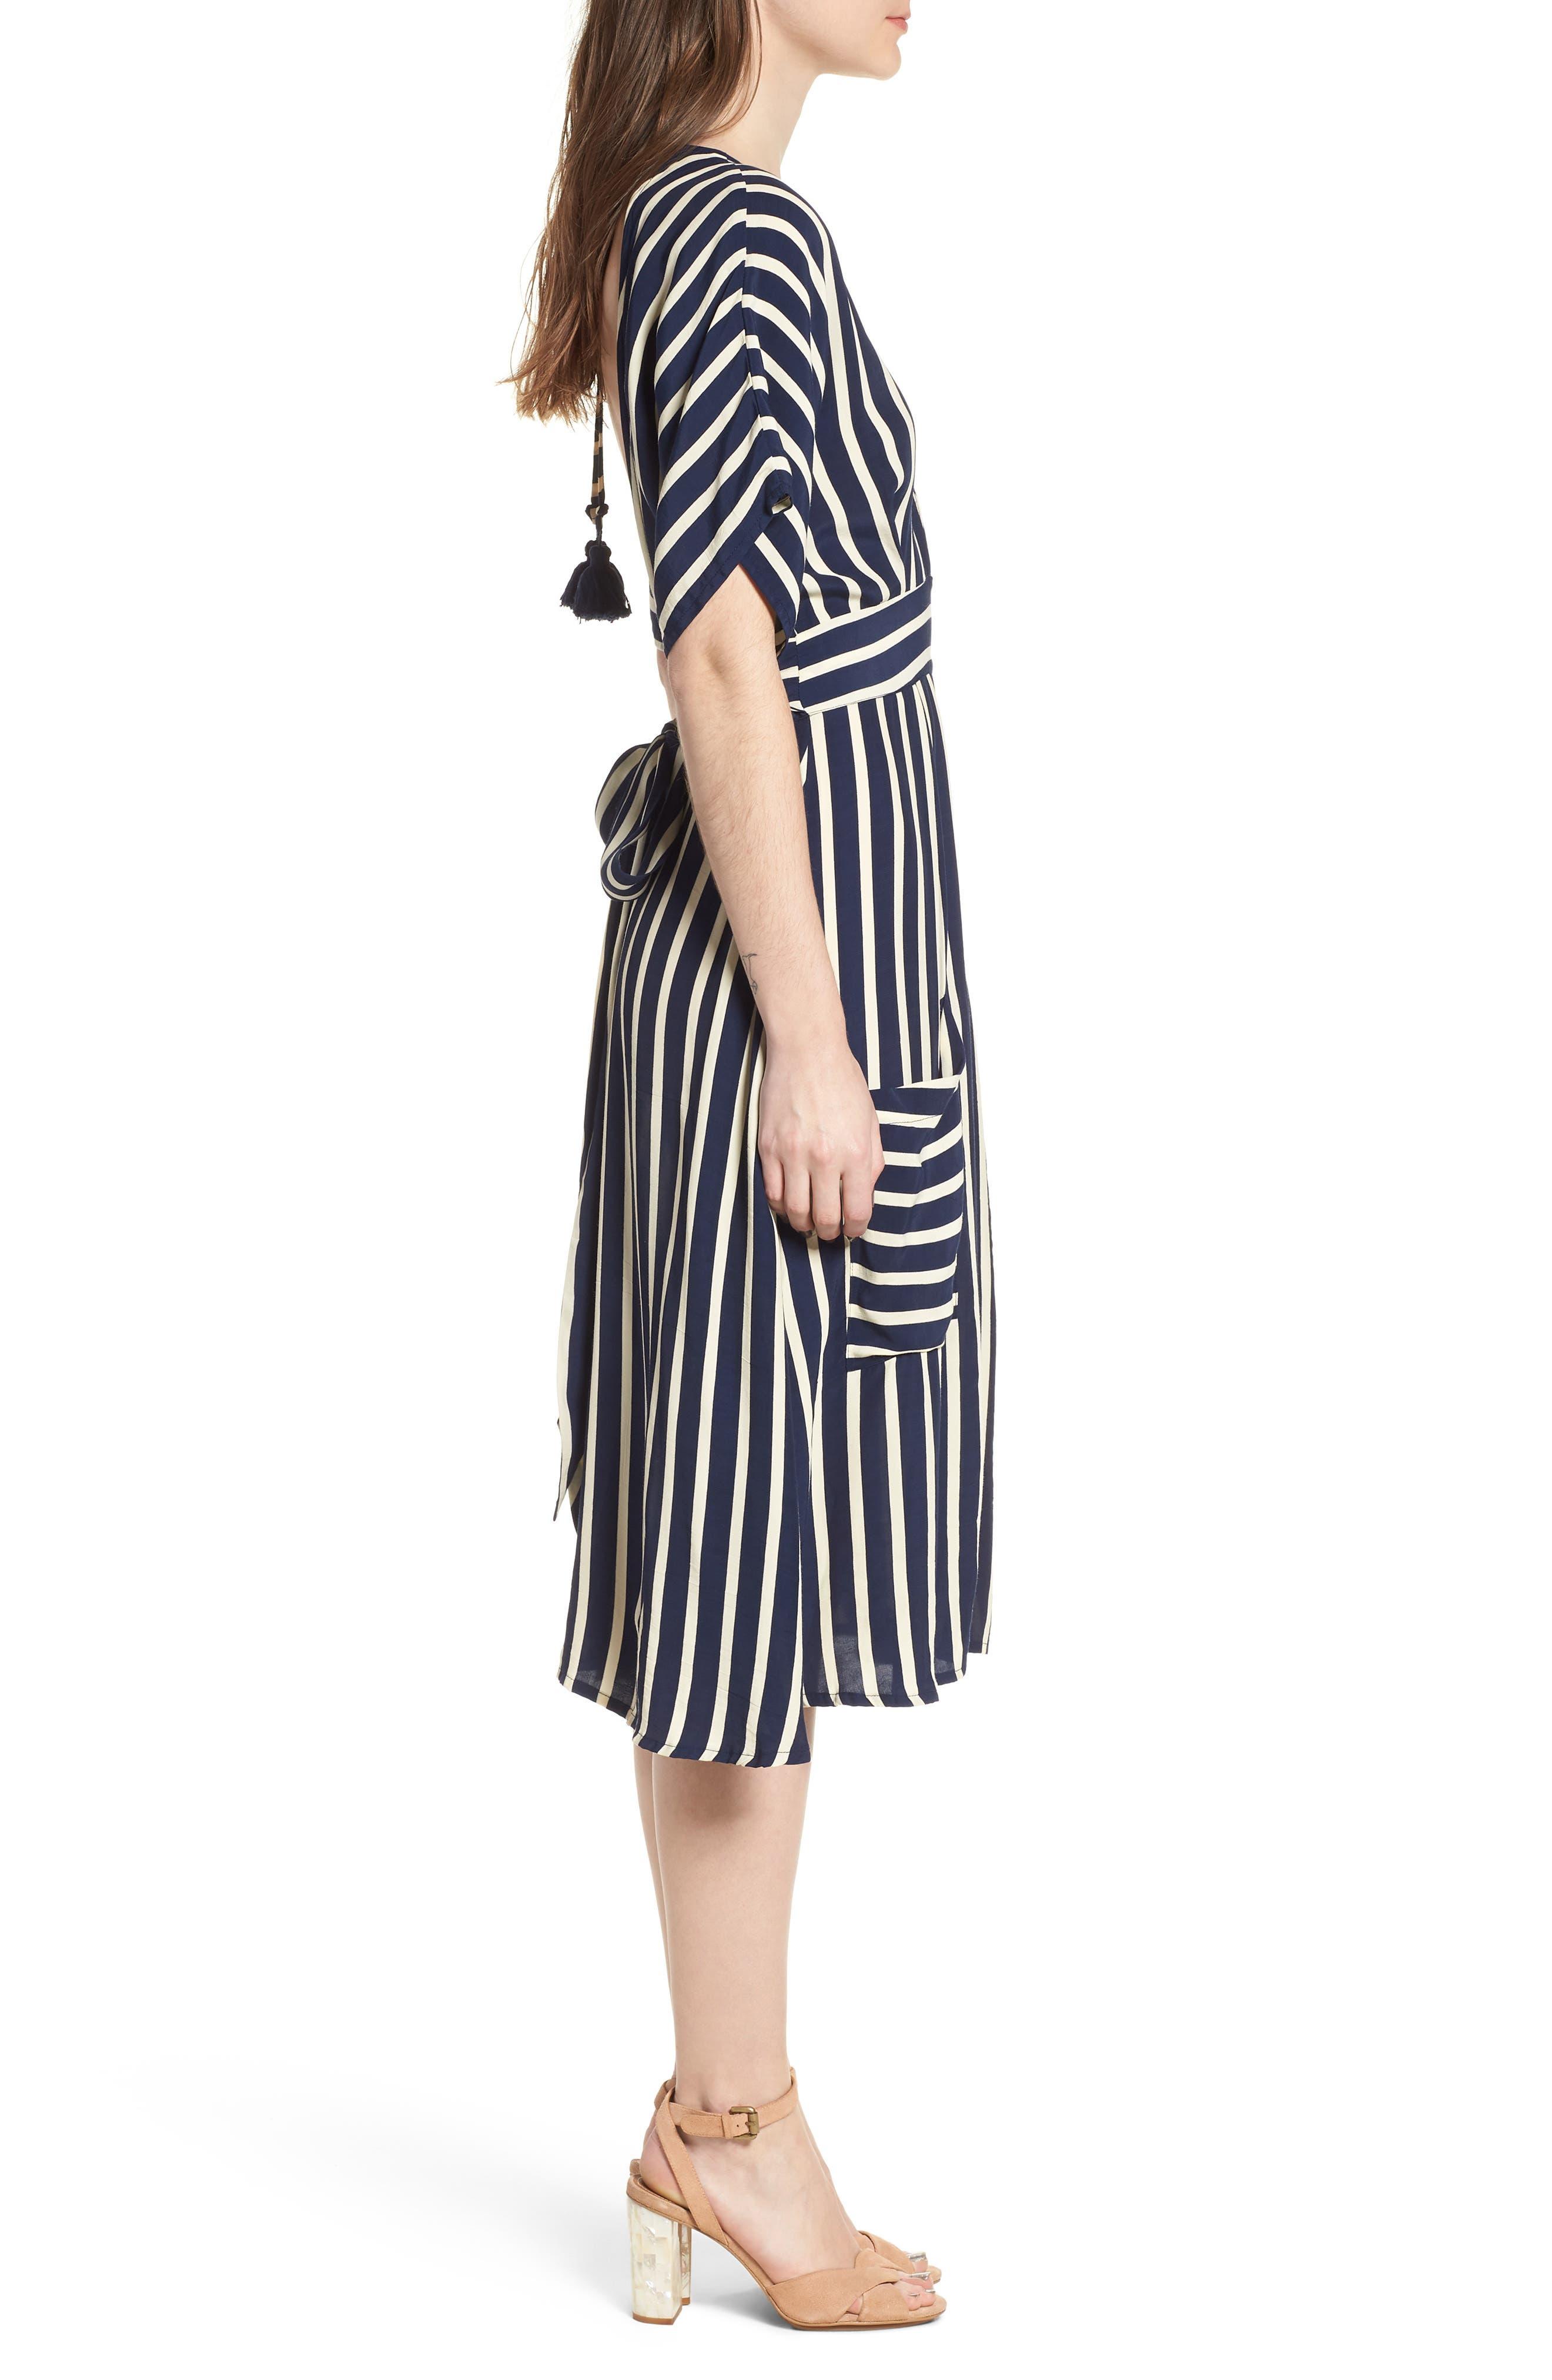 Milan Stripe Midi Dress,                             Alternate thumbnail 3, color,                             Mazur Stripe Print Navy